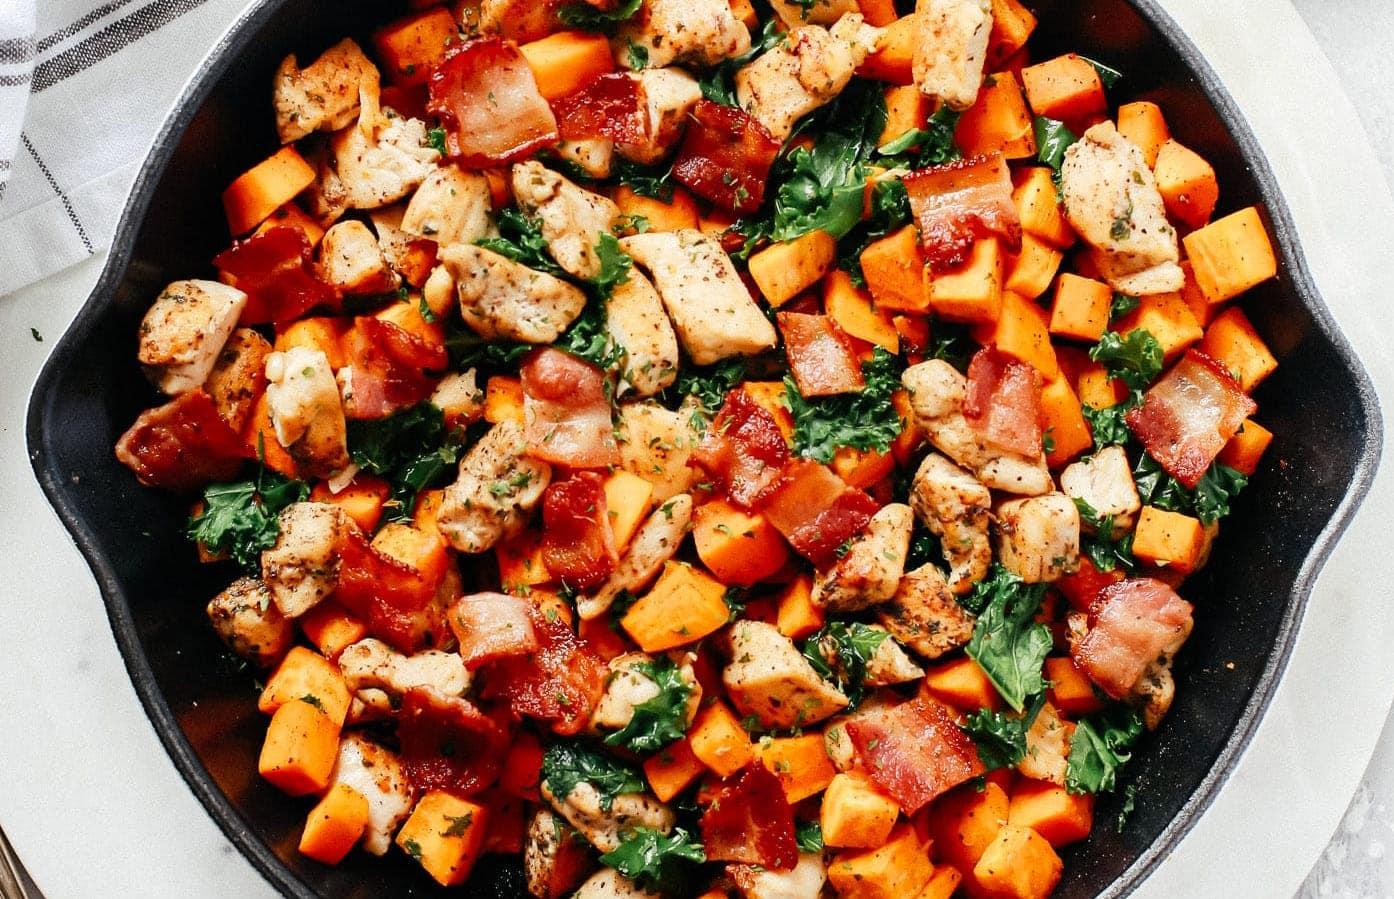 Sweet Potato Chicken Kale Skillet